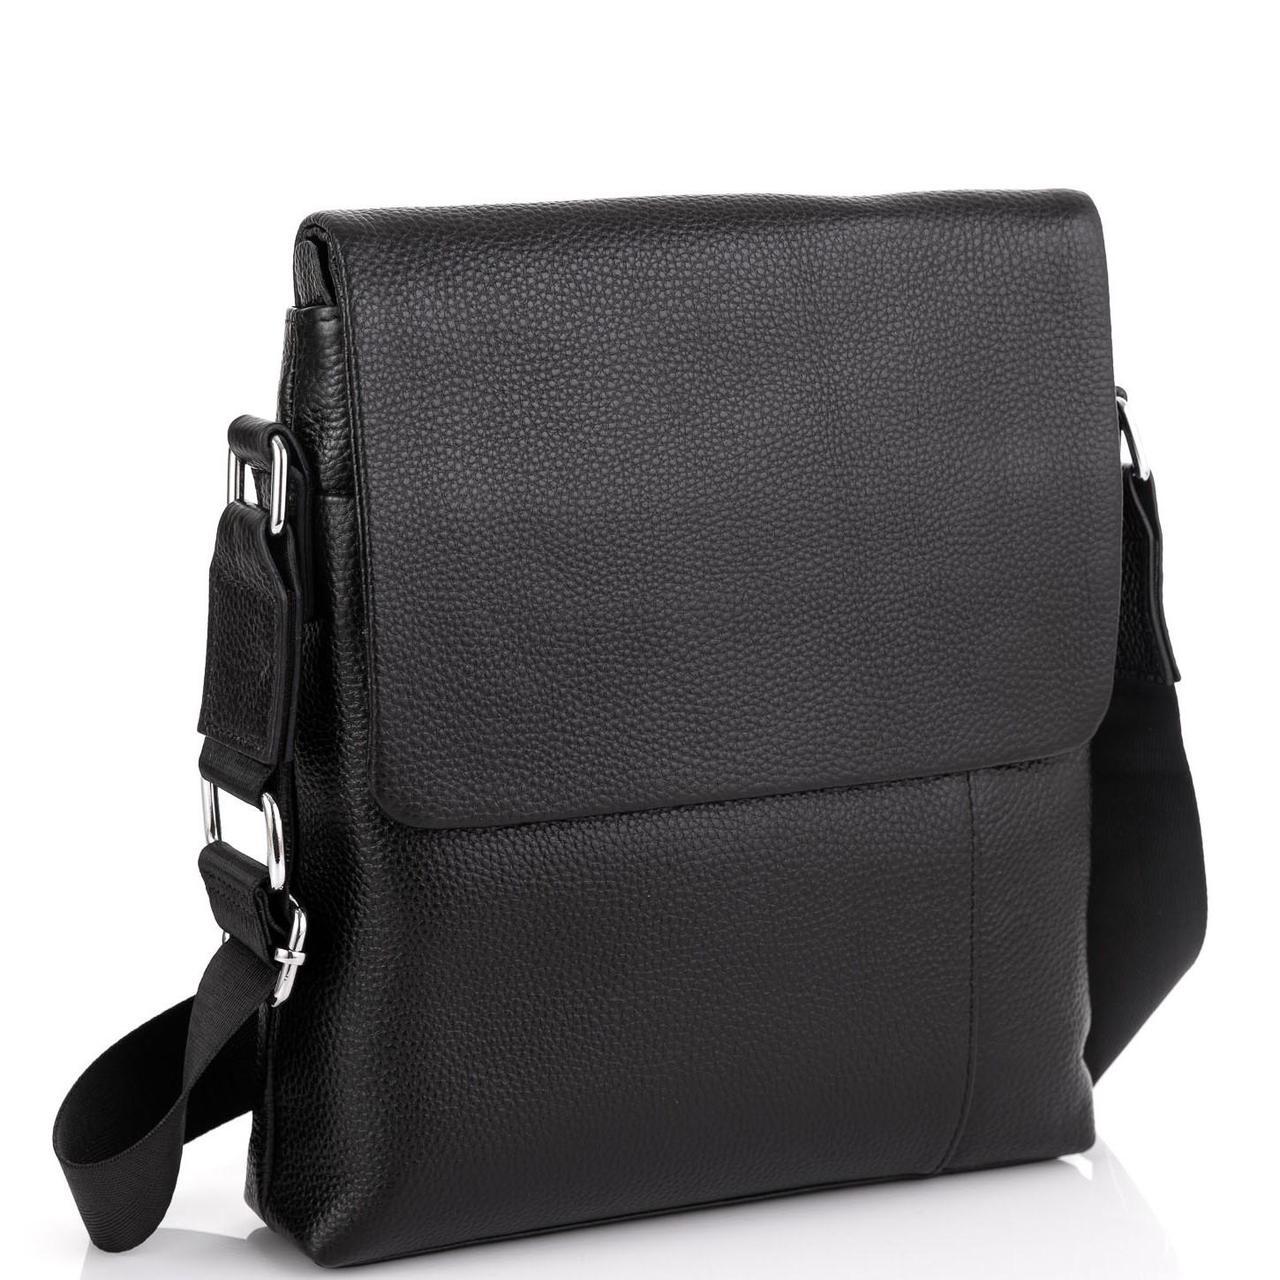 Шкіряна сумка через плече з клапаном Tiding Bag A25F-8878A